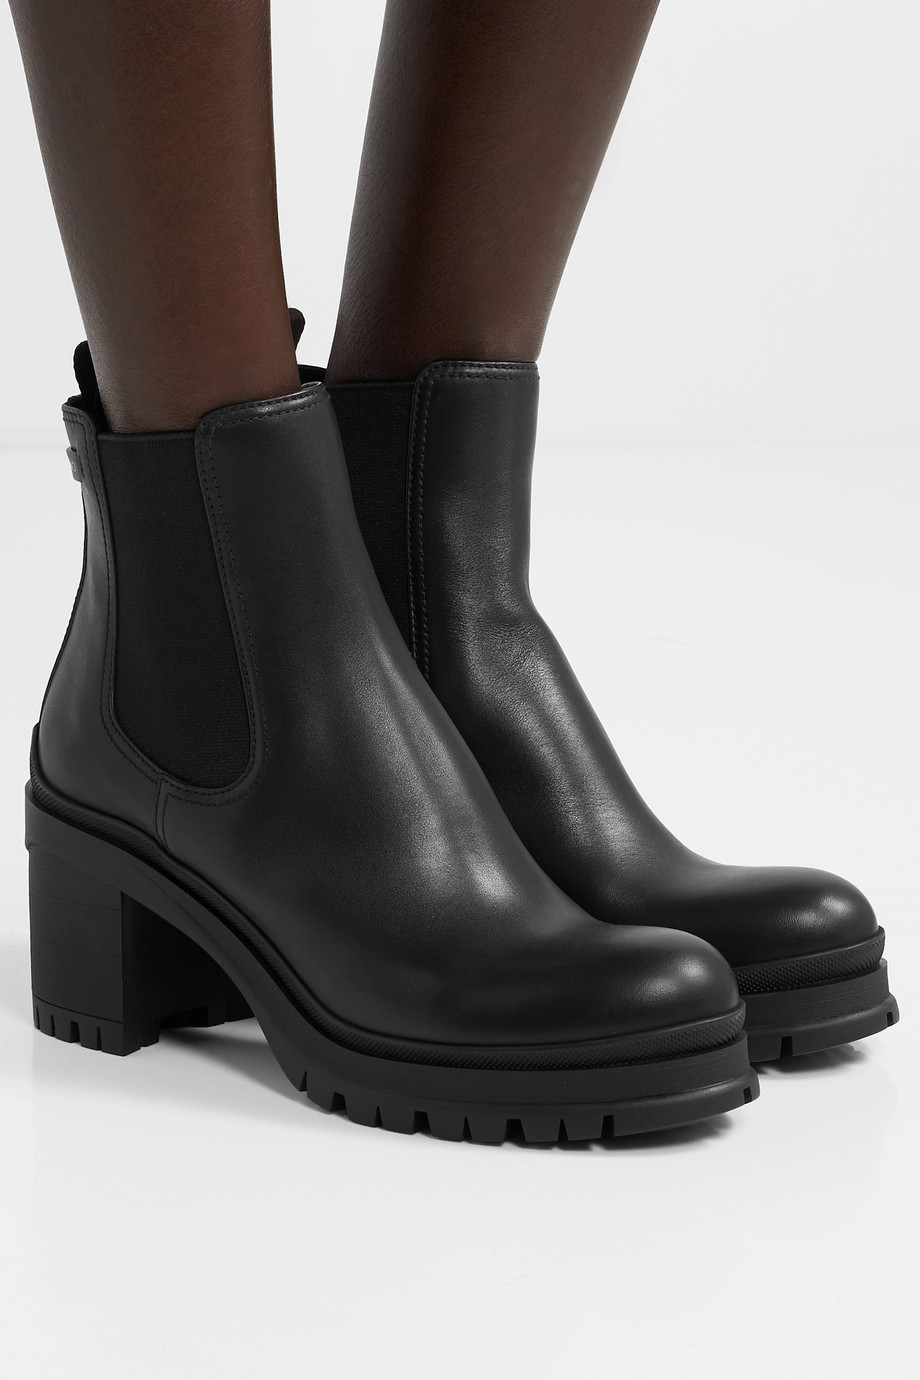 Prada 55 leather Chelsea boots